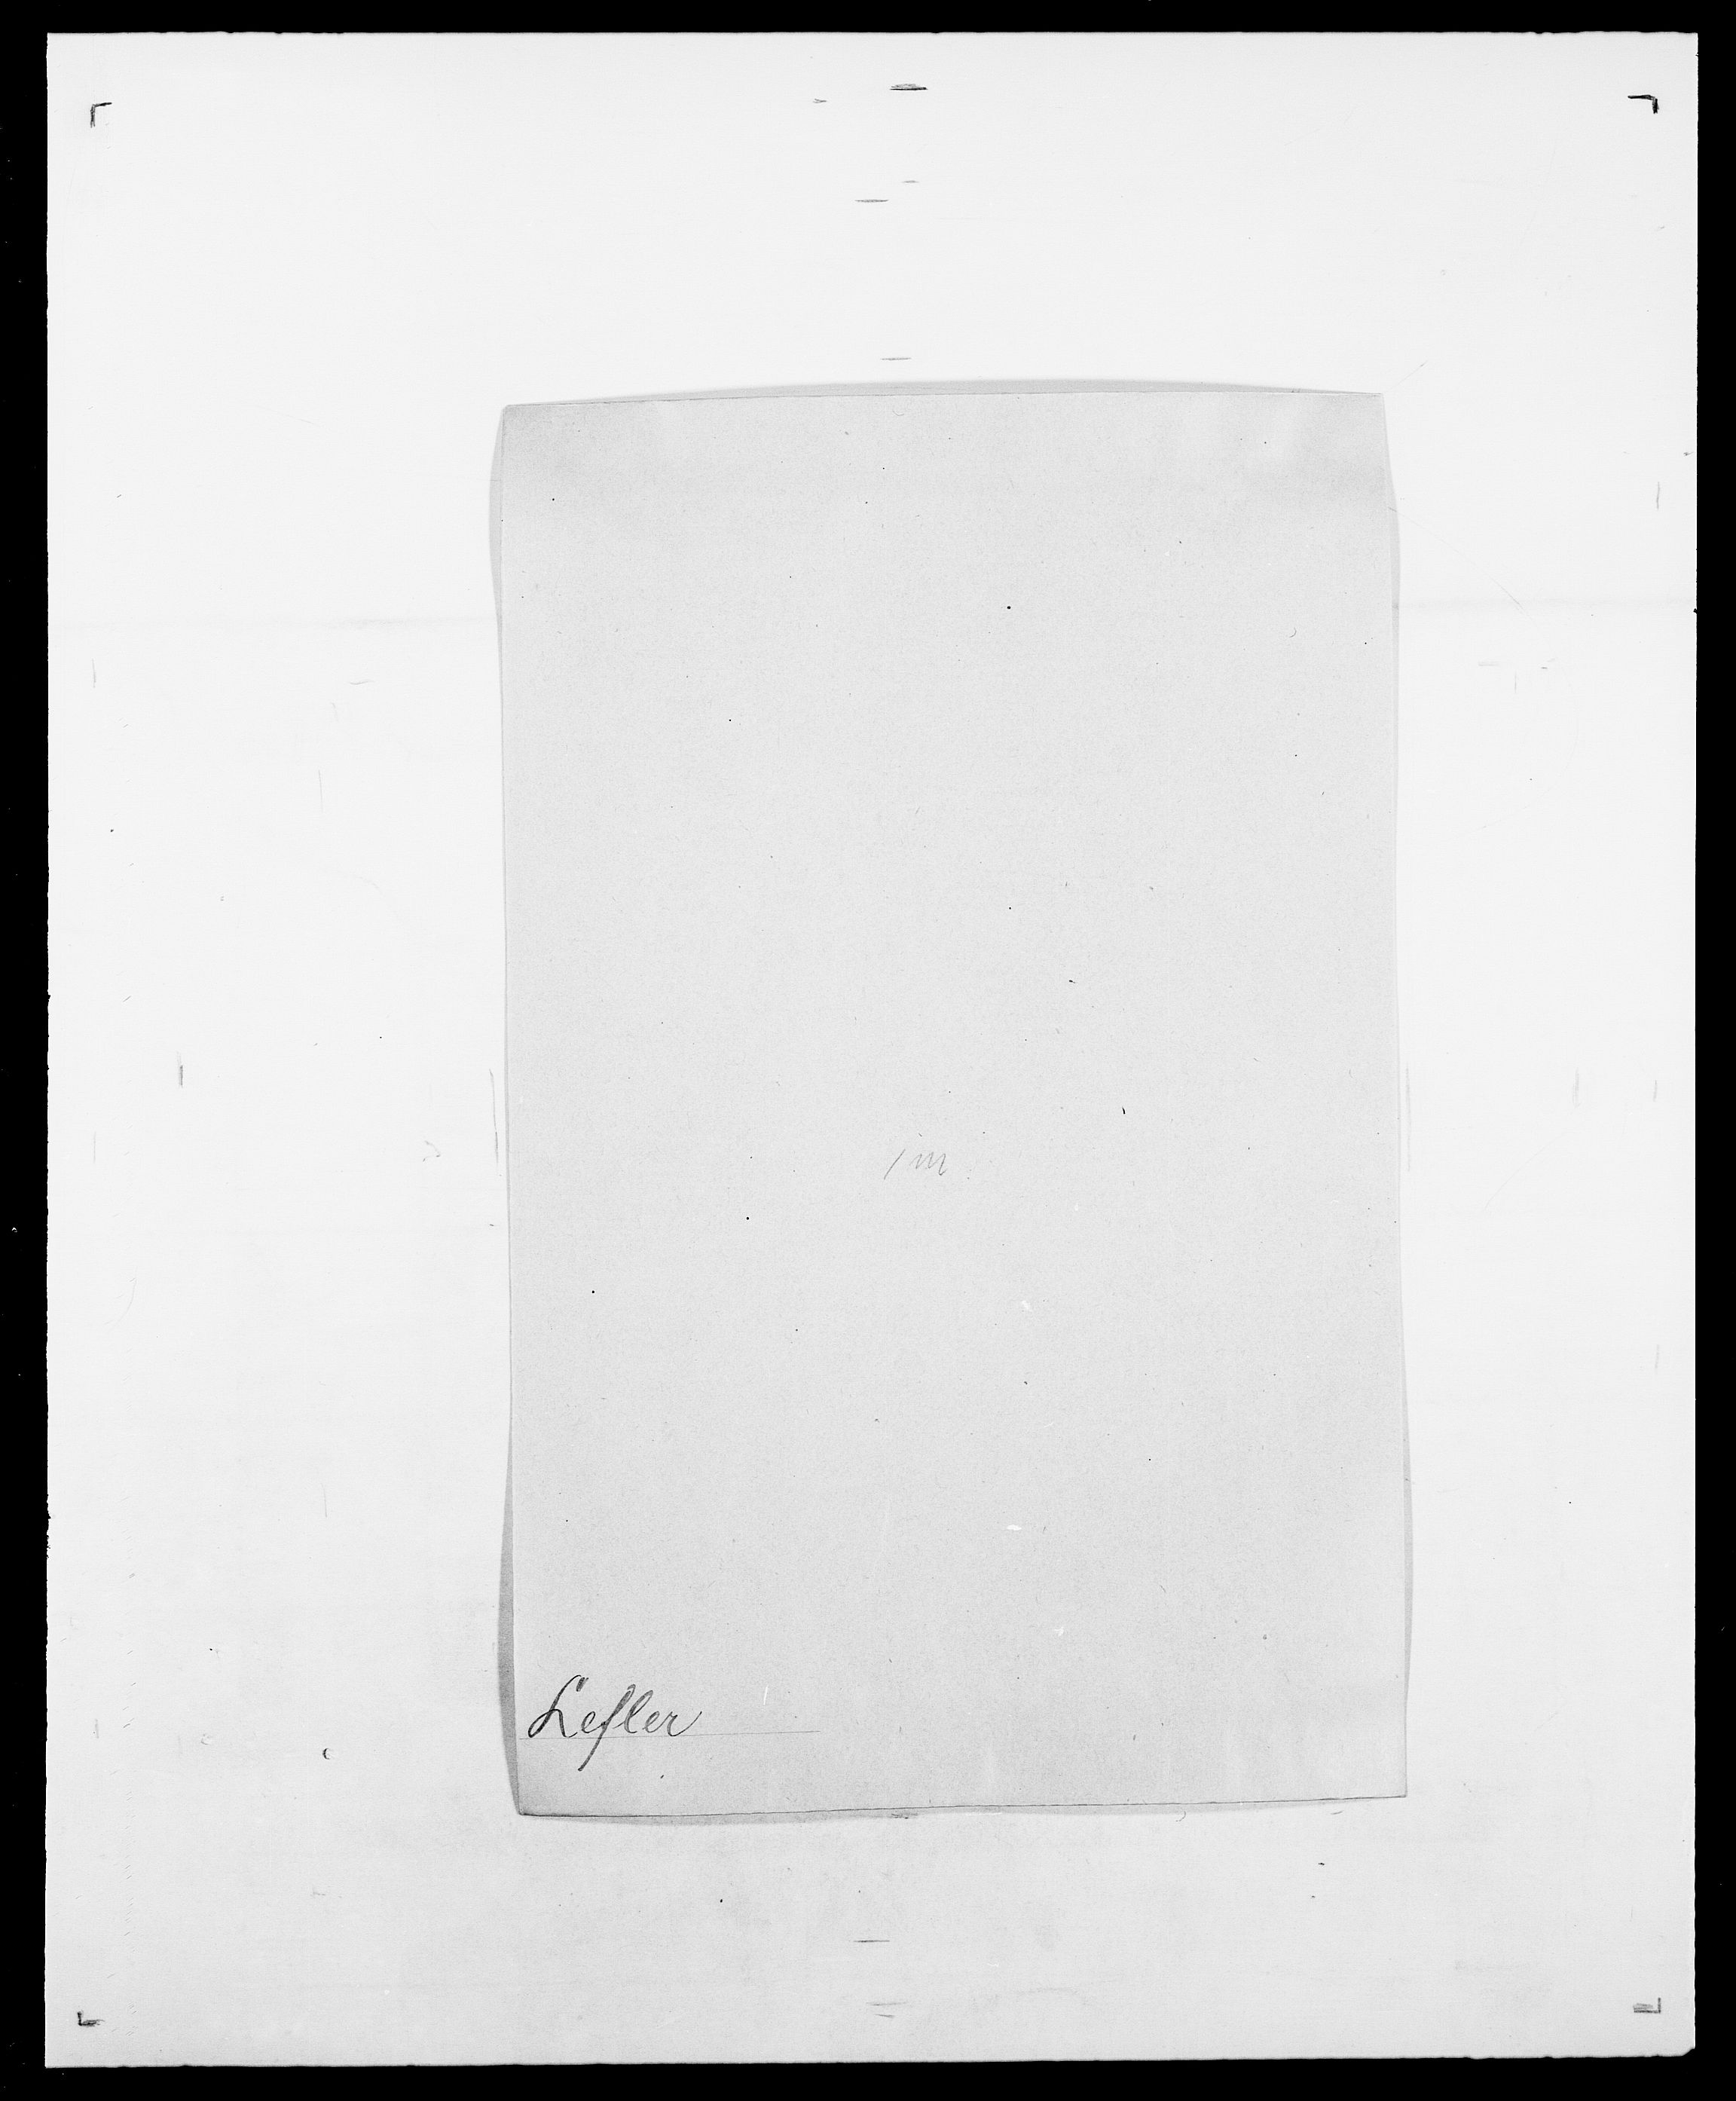 SAO, Delgobe, Charles Antoine - samling, D/Da/L0023: Lau - Lirvyn, s. 88